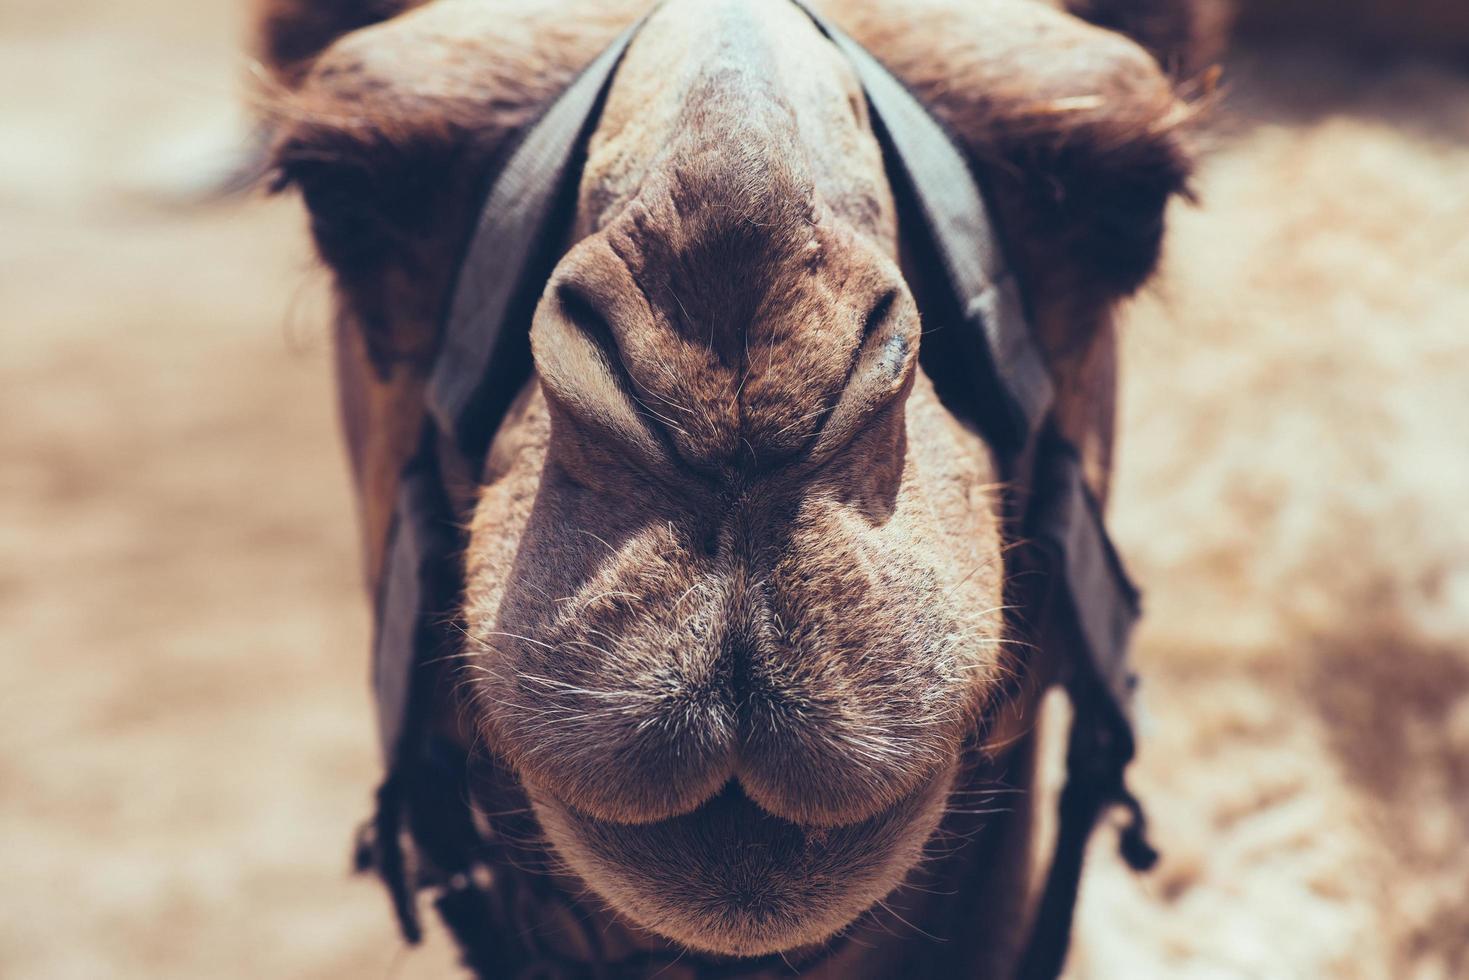 kamel ansikte närbild foto